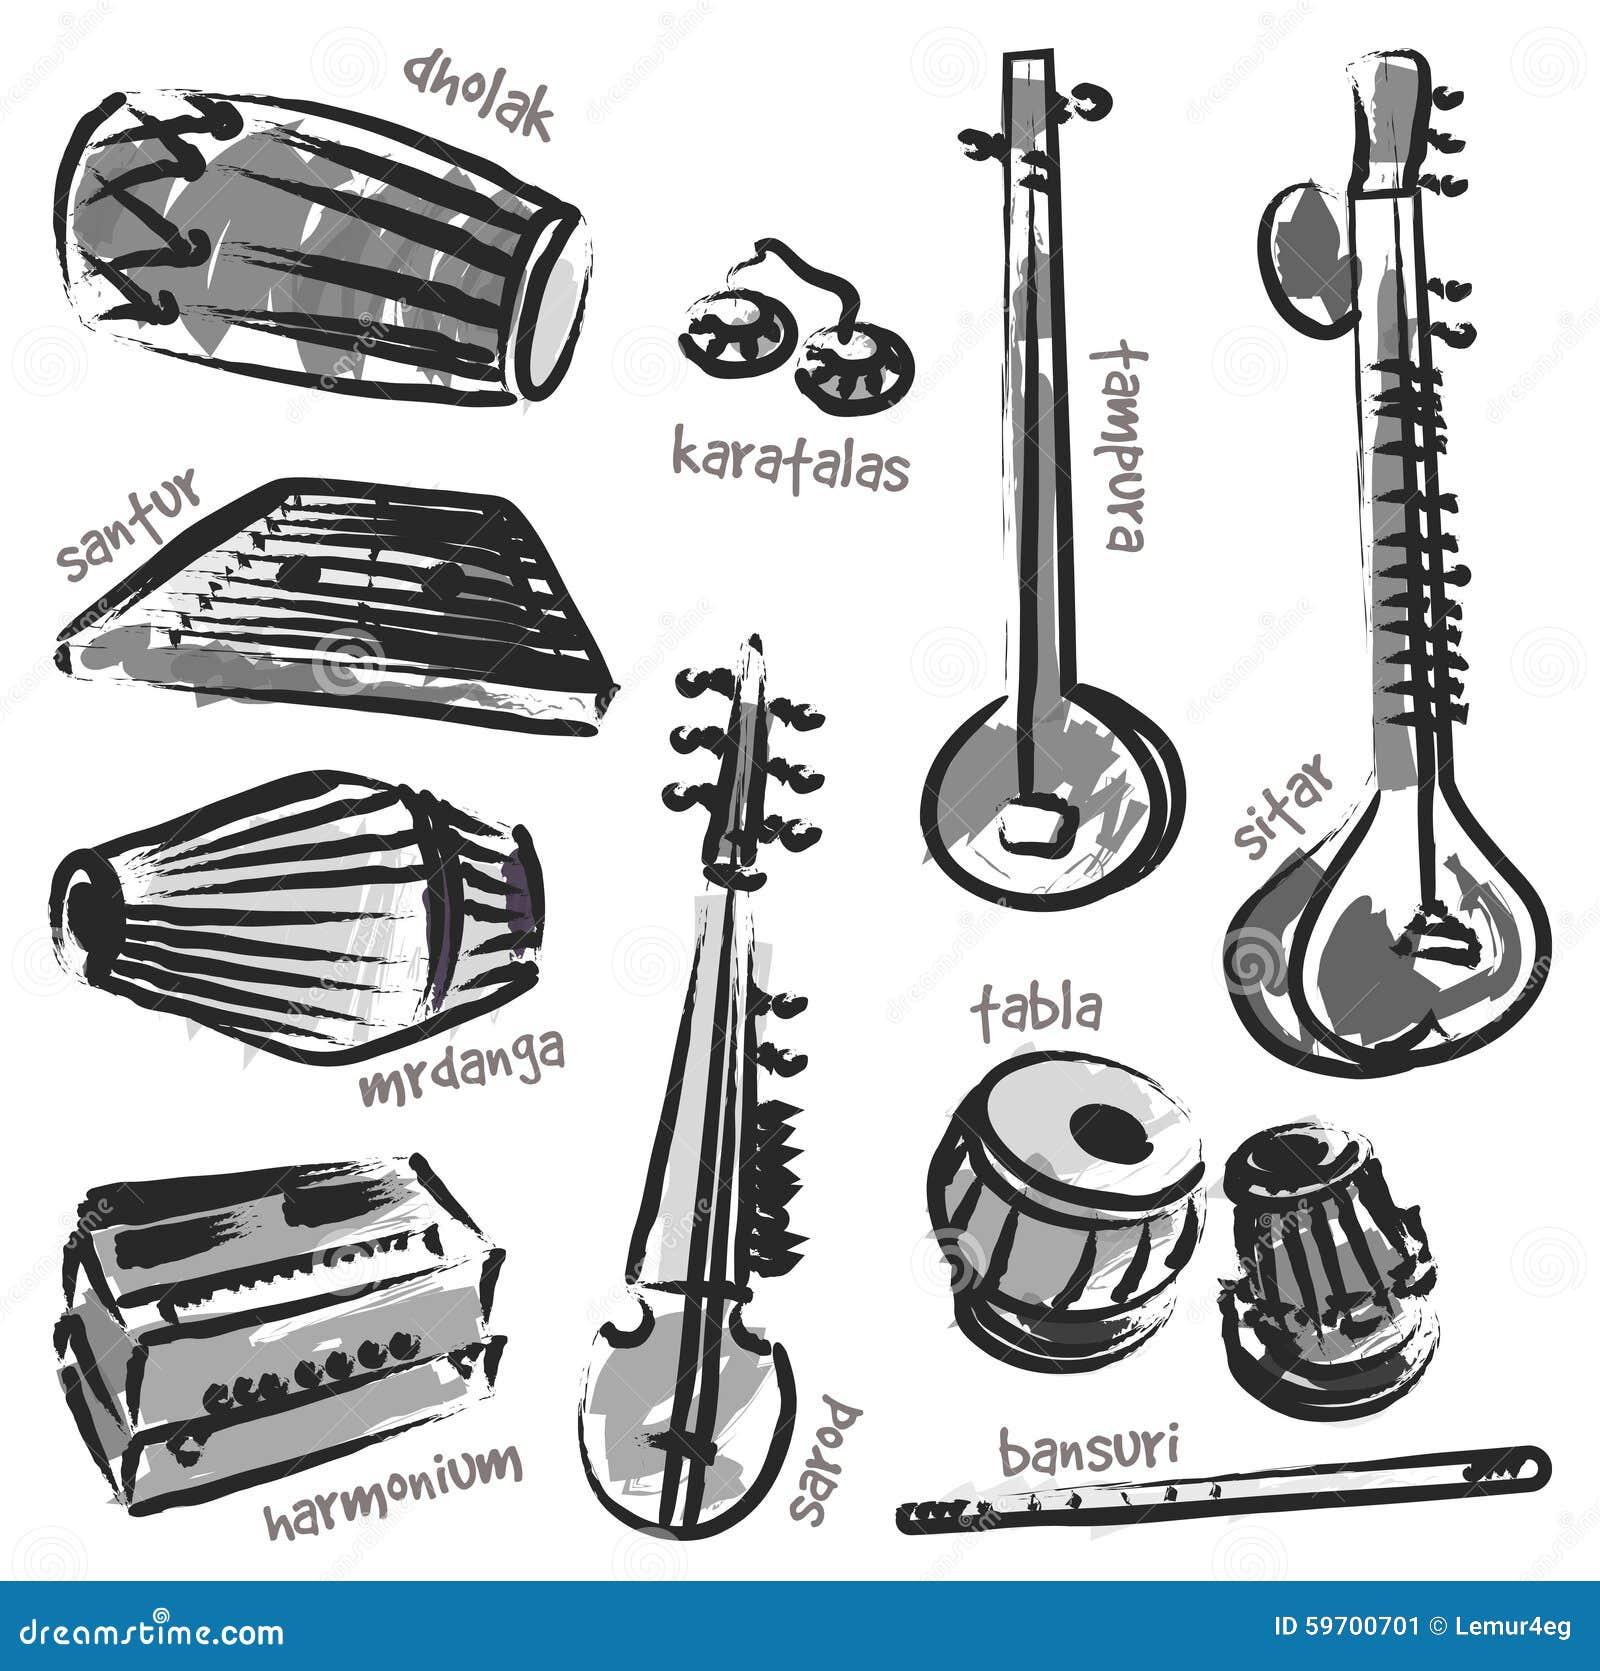 Indian instruments stock vector. Image of bansuri, rhythm ...